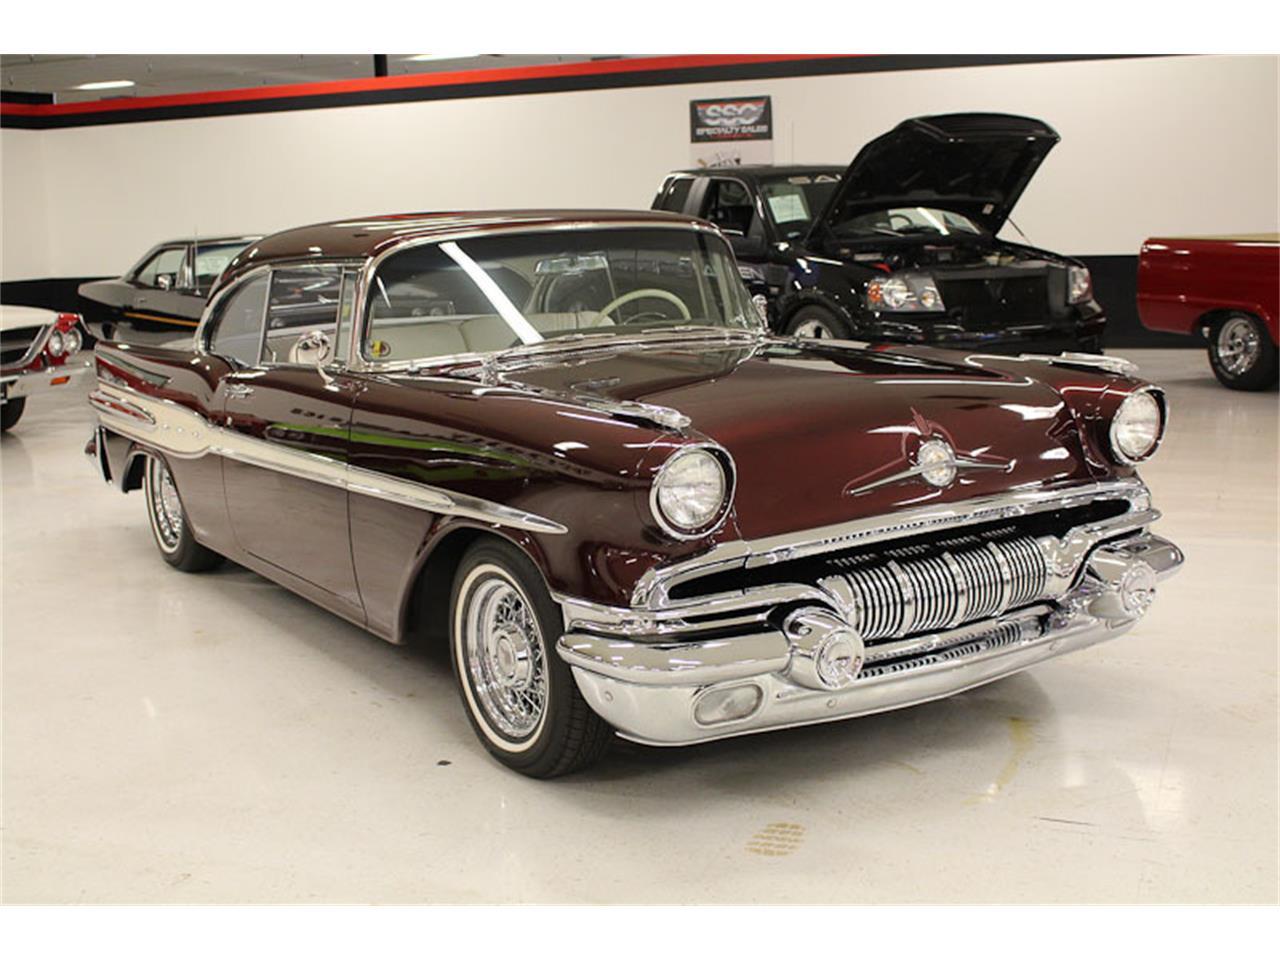 Large Picture of Classic '57 Pontiac Chieftain located in California - $74,990.00 - ESOB